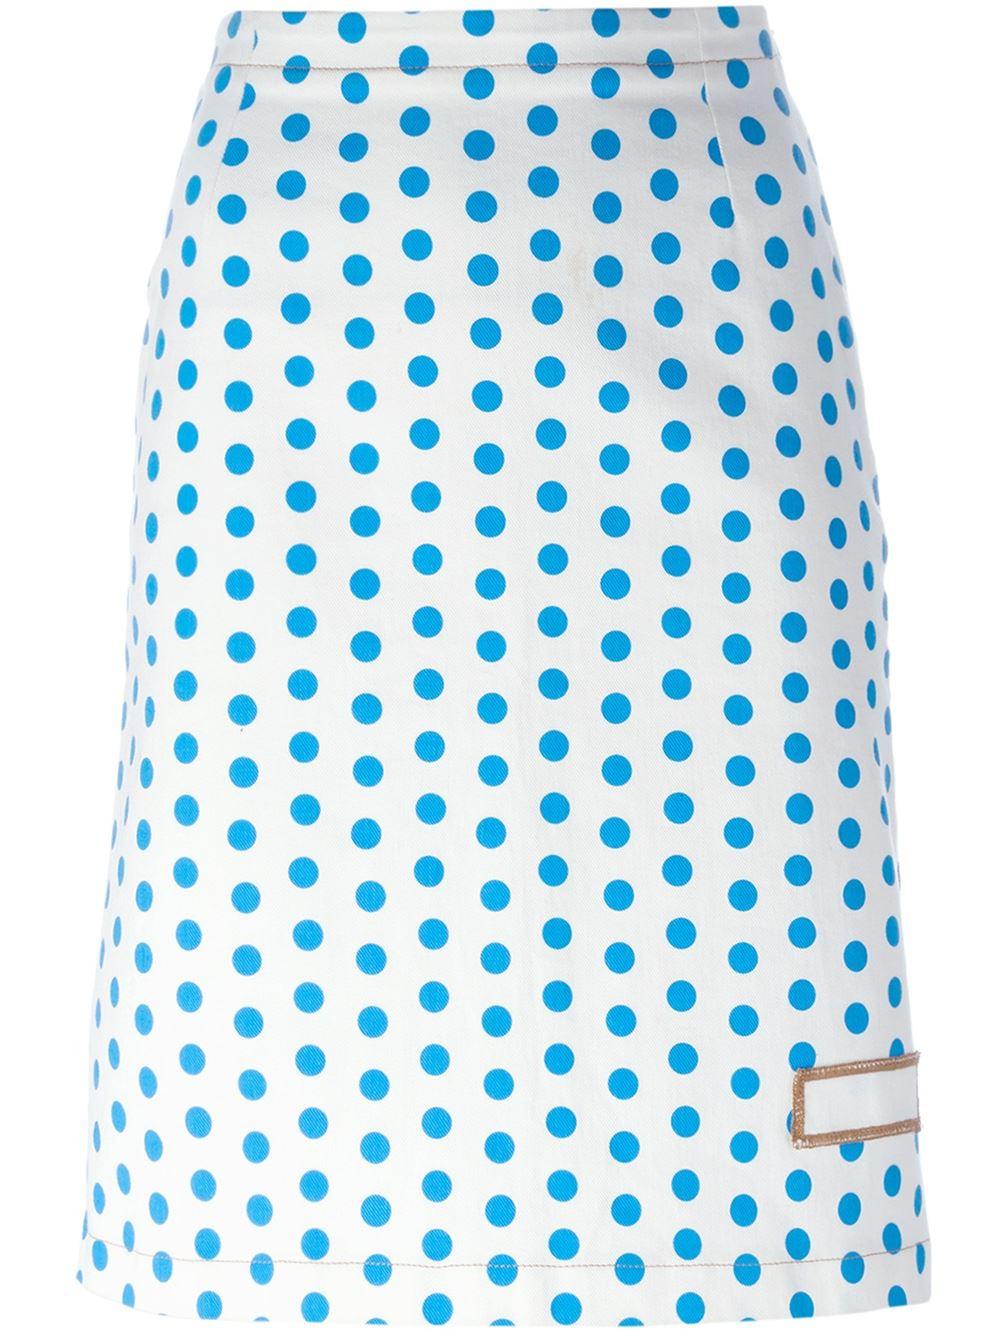 j w polka dot skirt in blue save 30 lyst